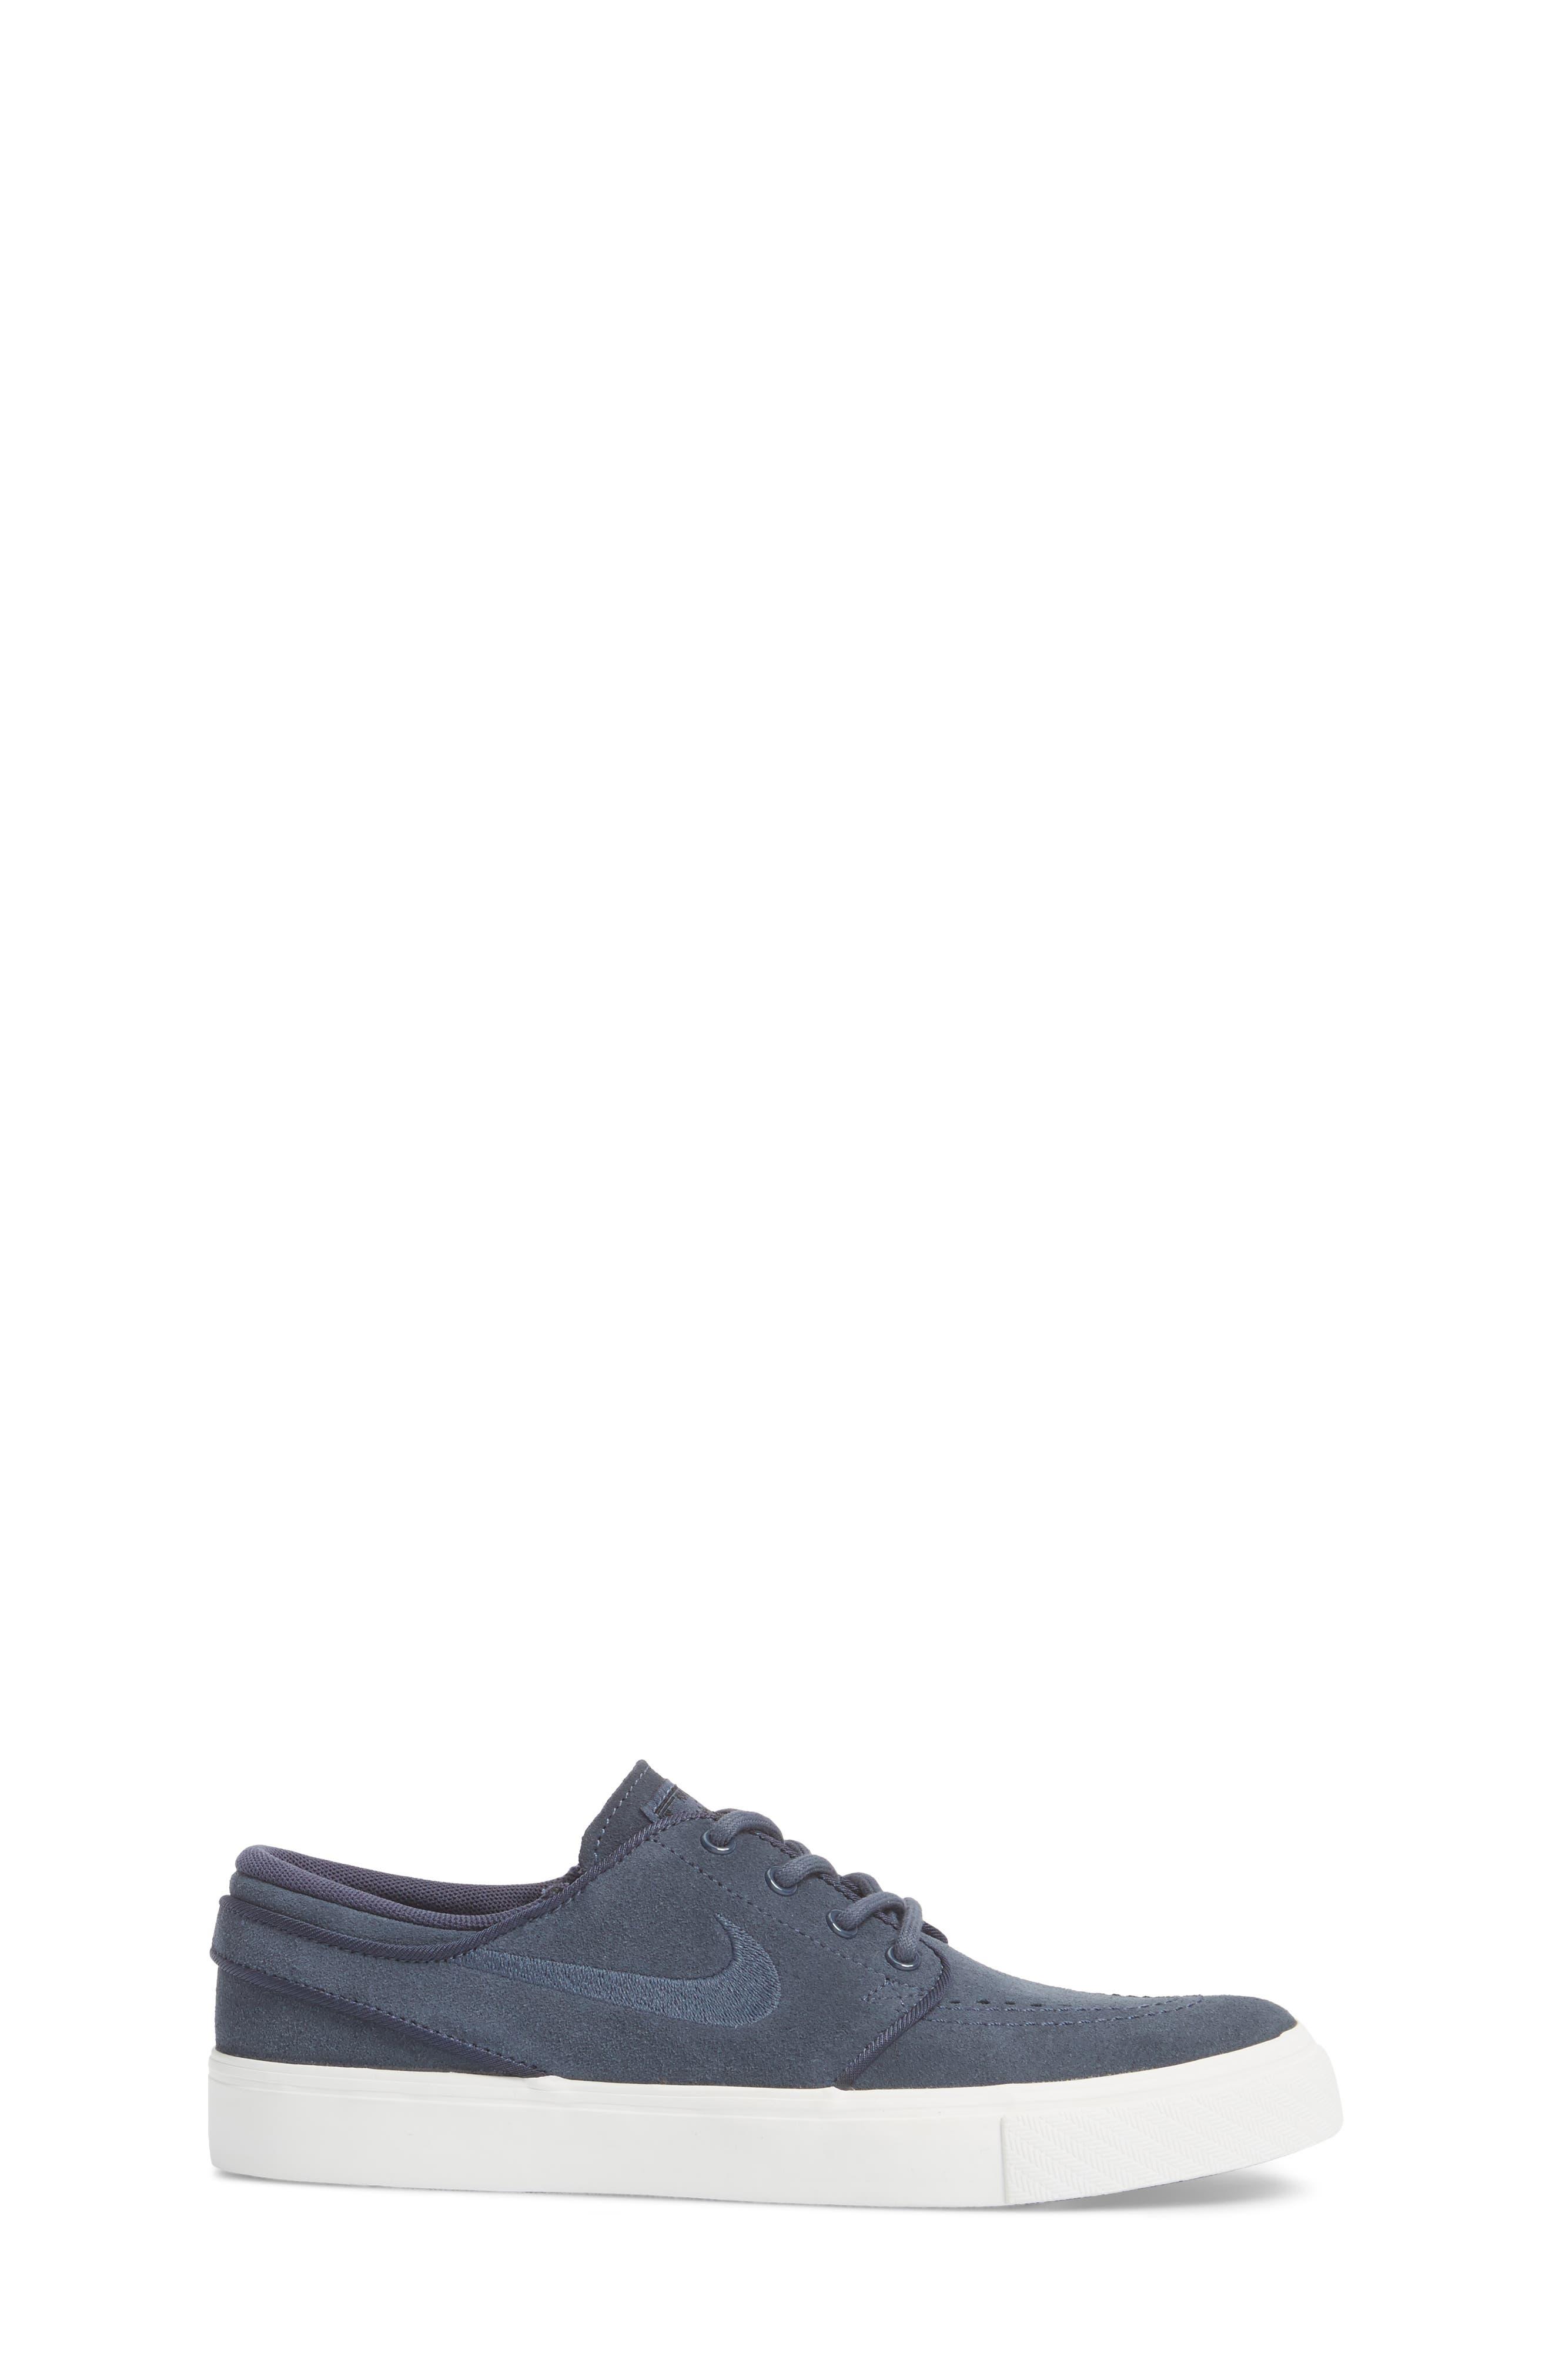 'Stefan Janoski' Sneaker,                             Alternate thumbnail 29, color,